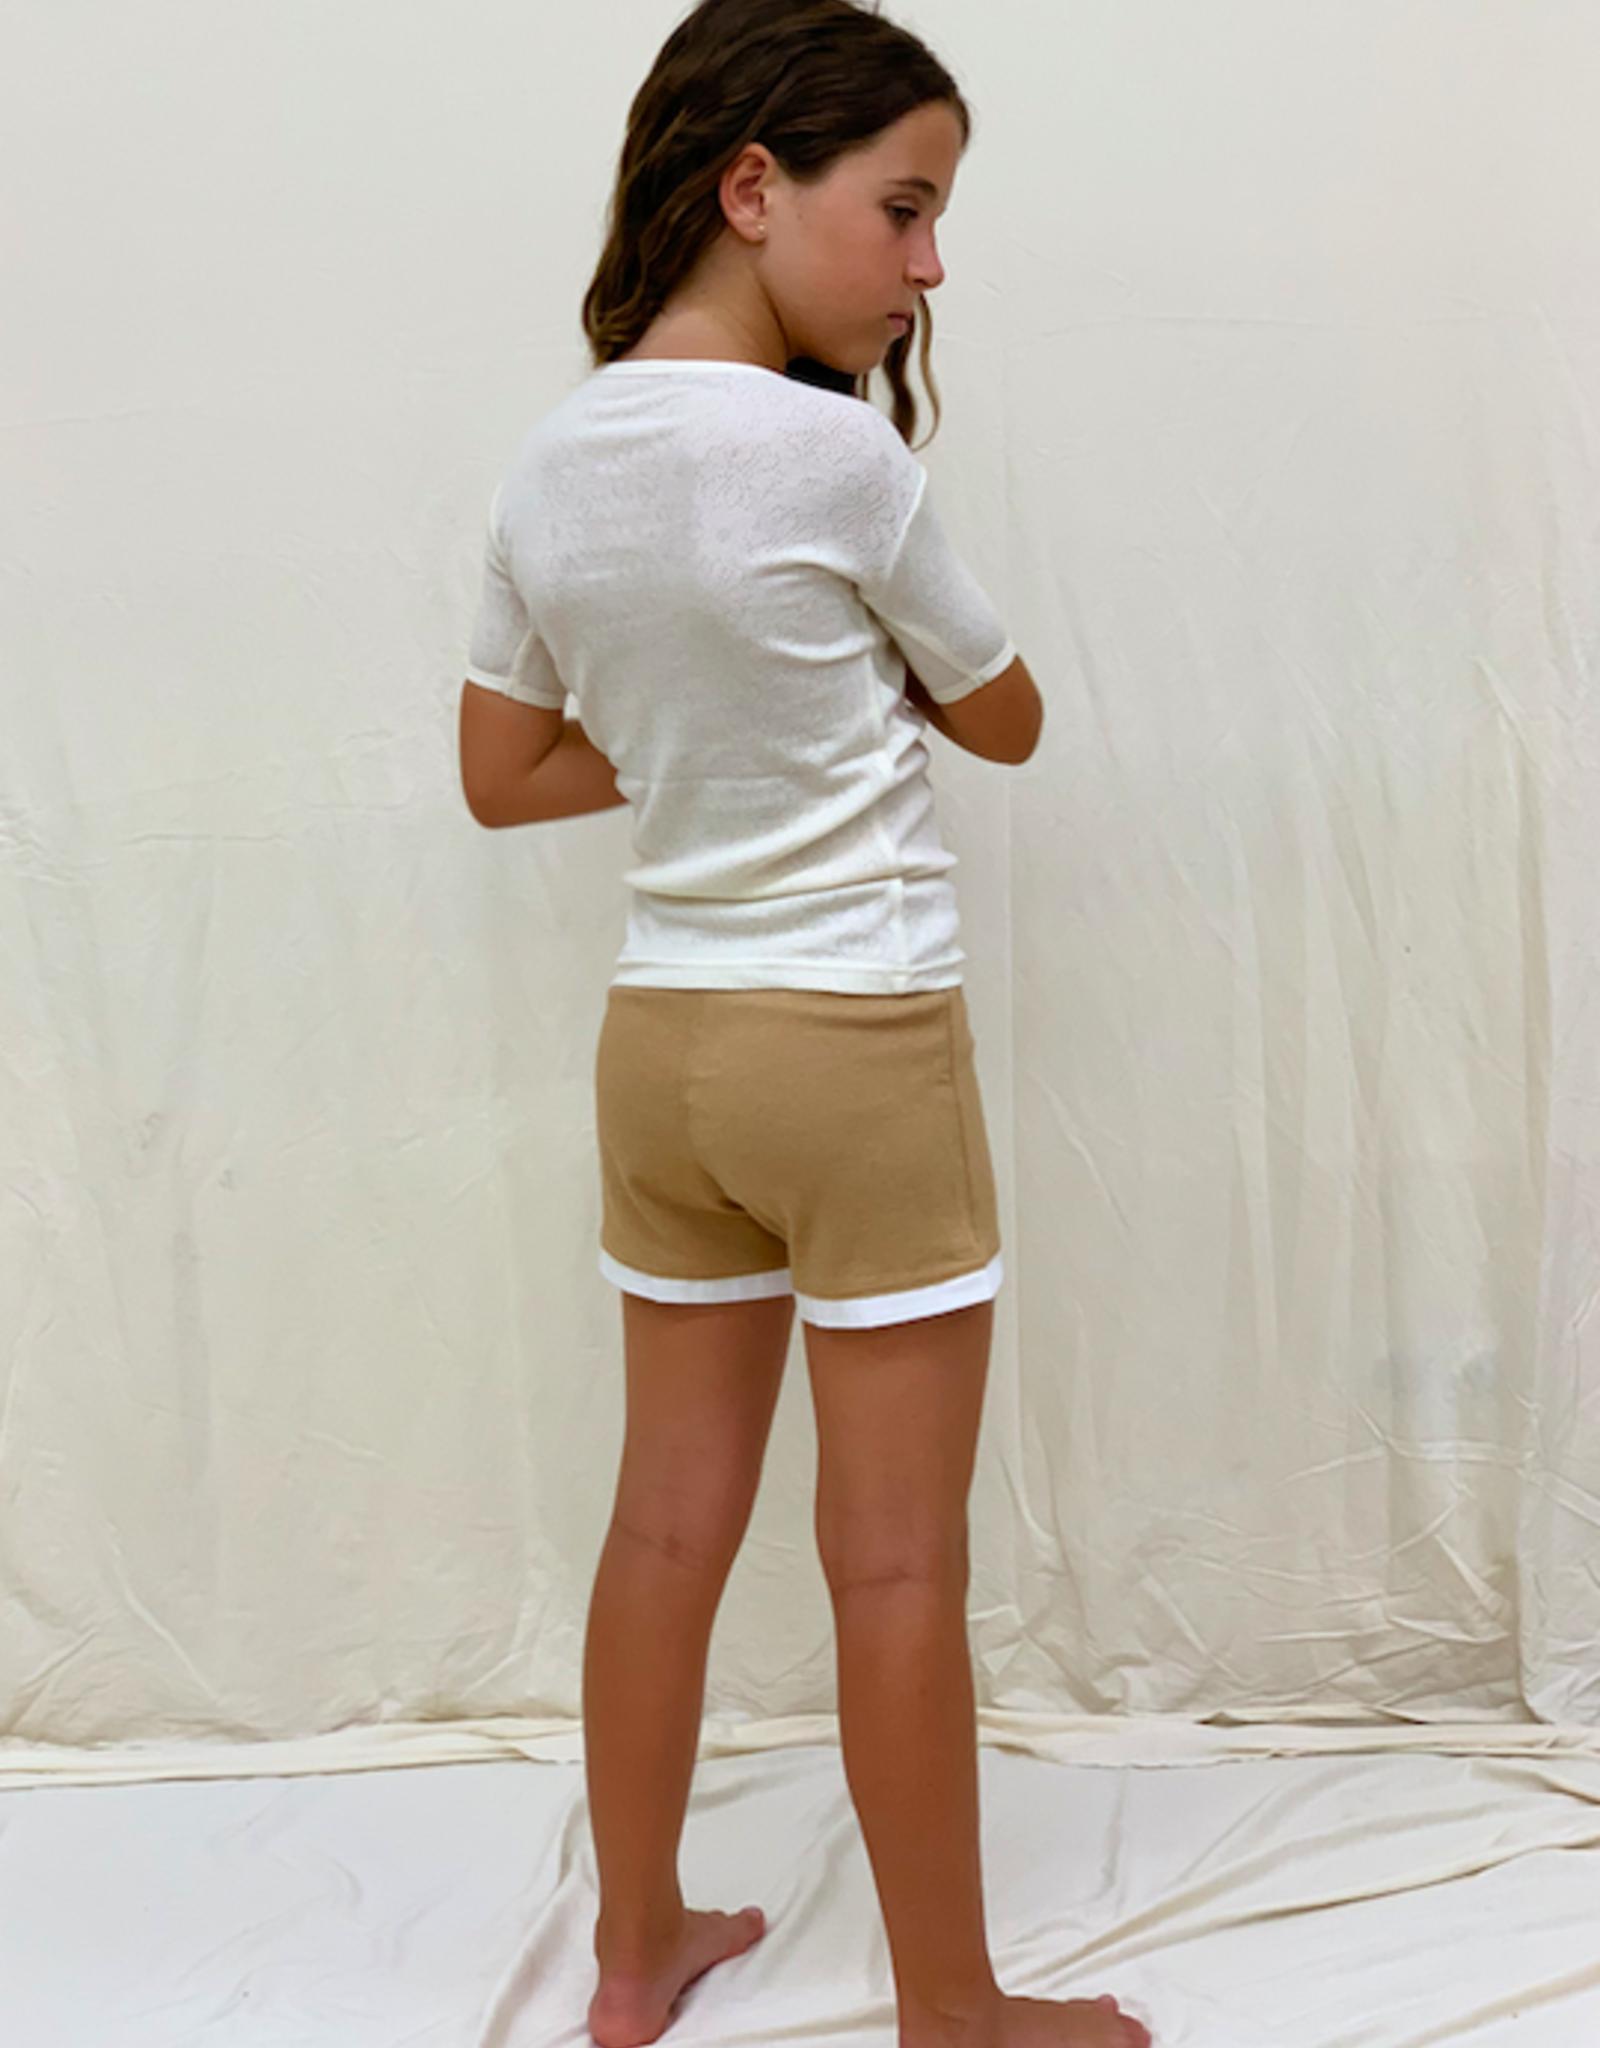 Shortsleeved openwok shirt for junior.. sizes 8, 10, 12 years.